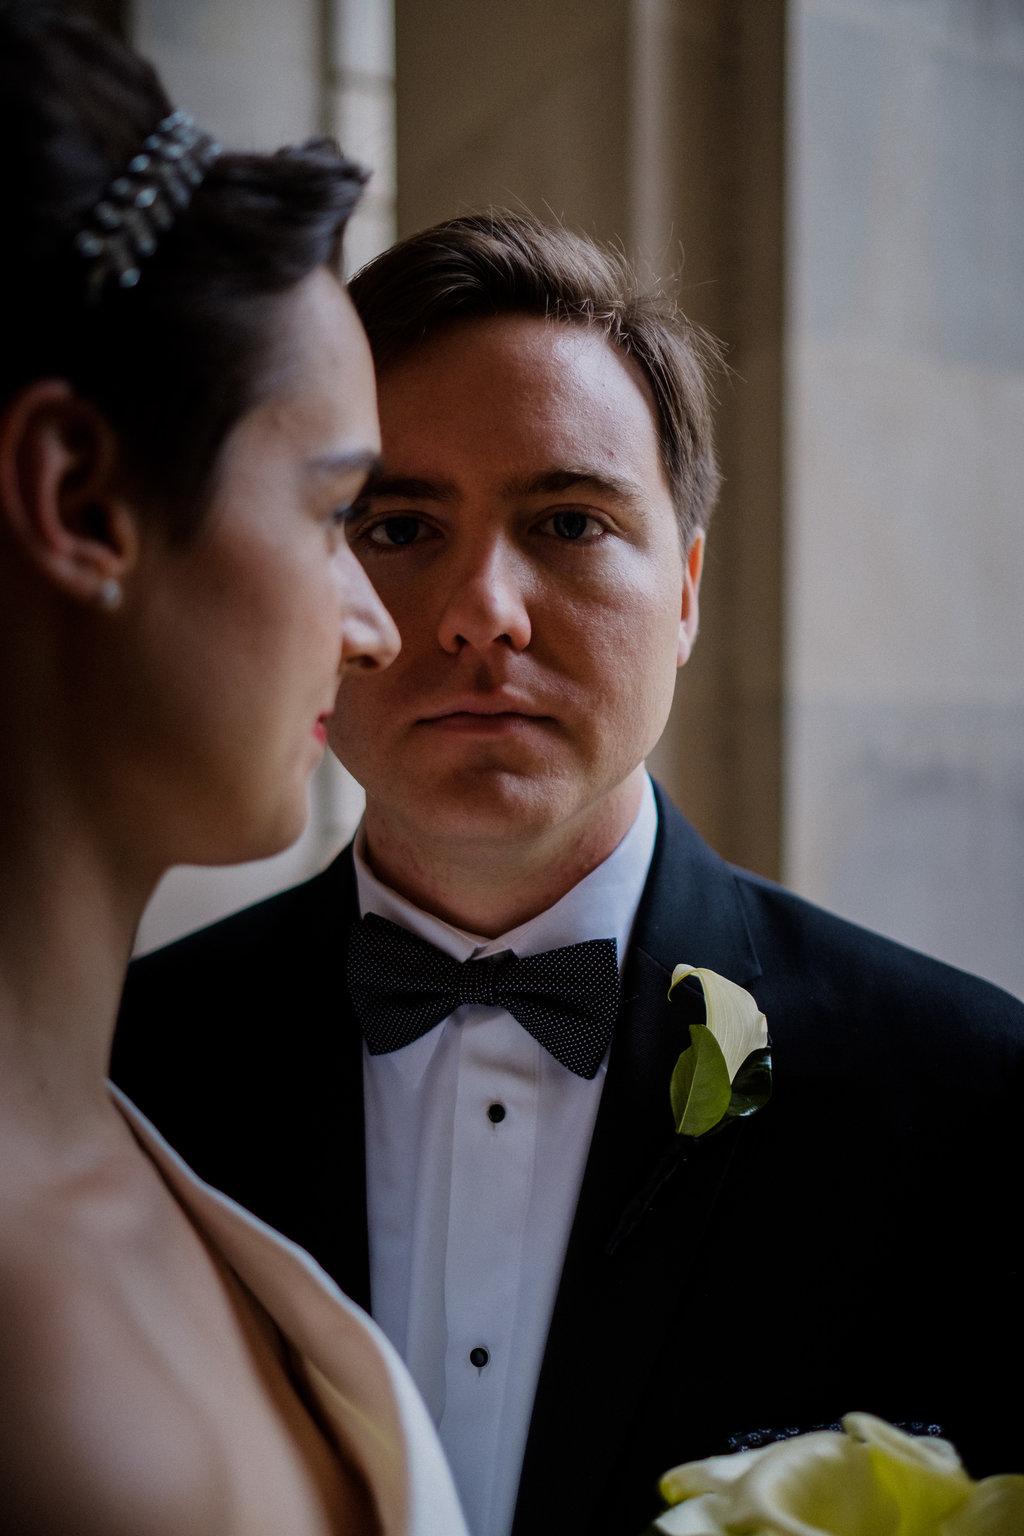 Andrew_Mellon_Washington_DC_Wedding_044.jpg